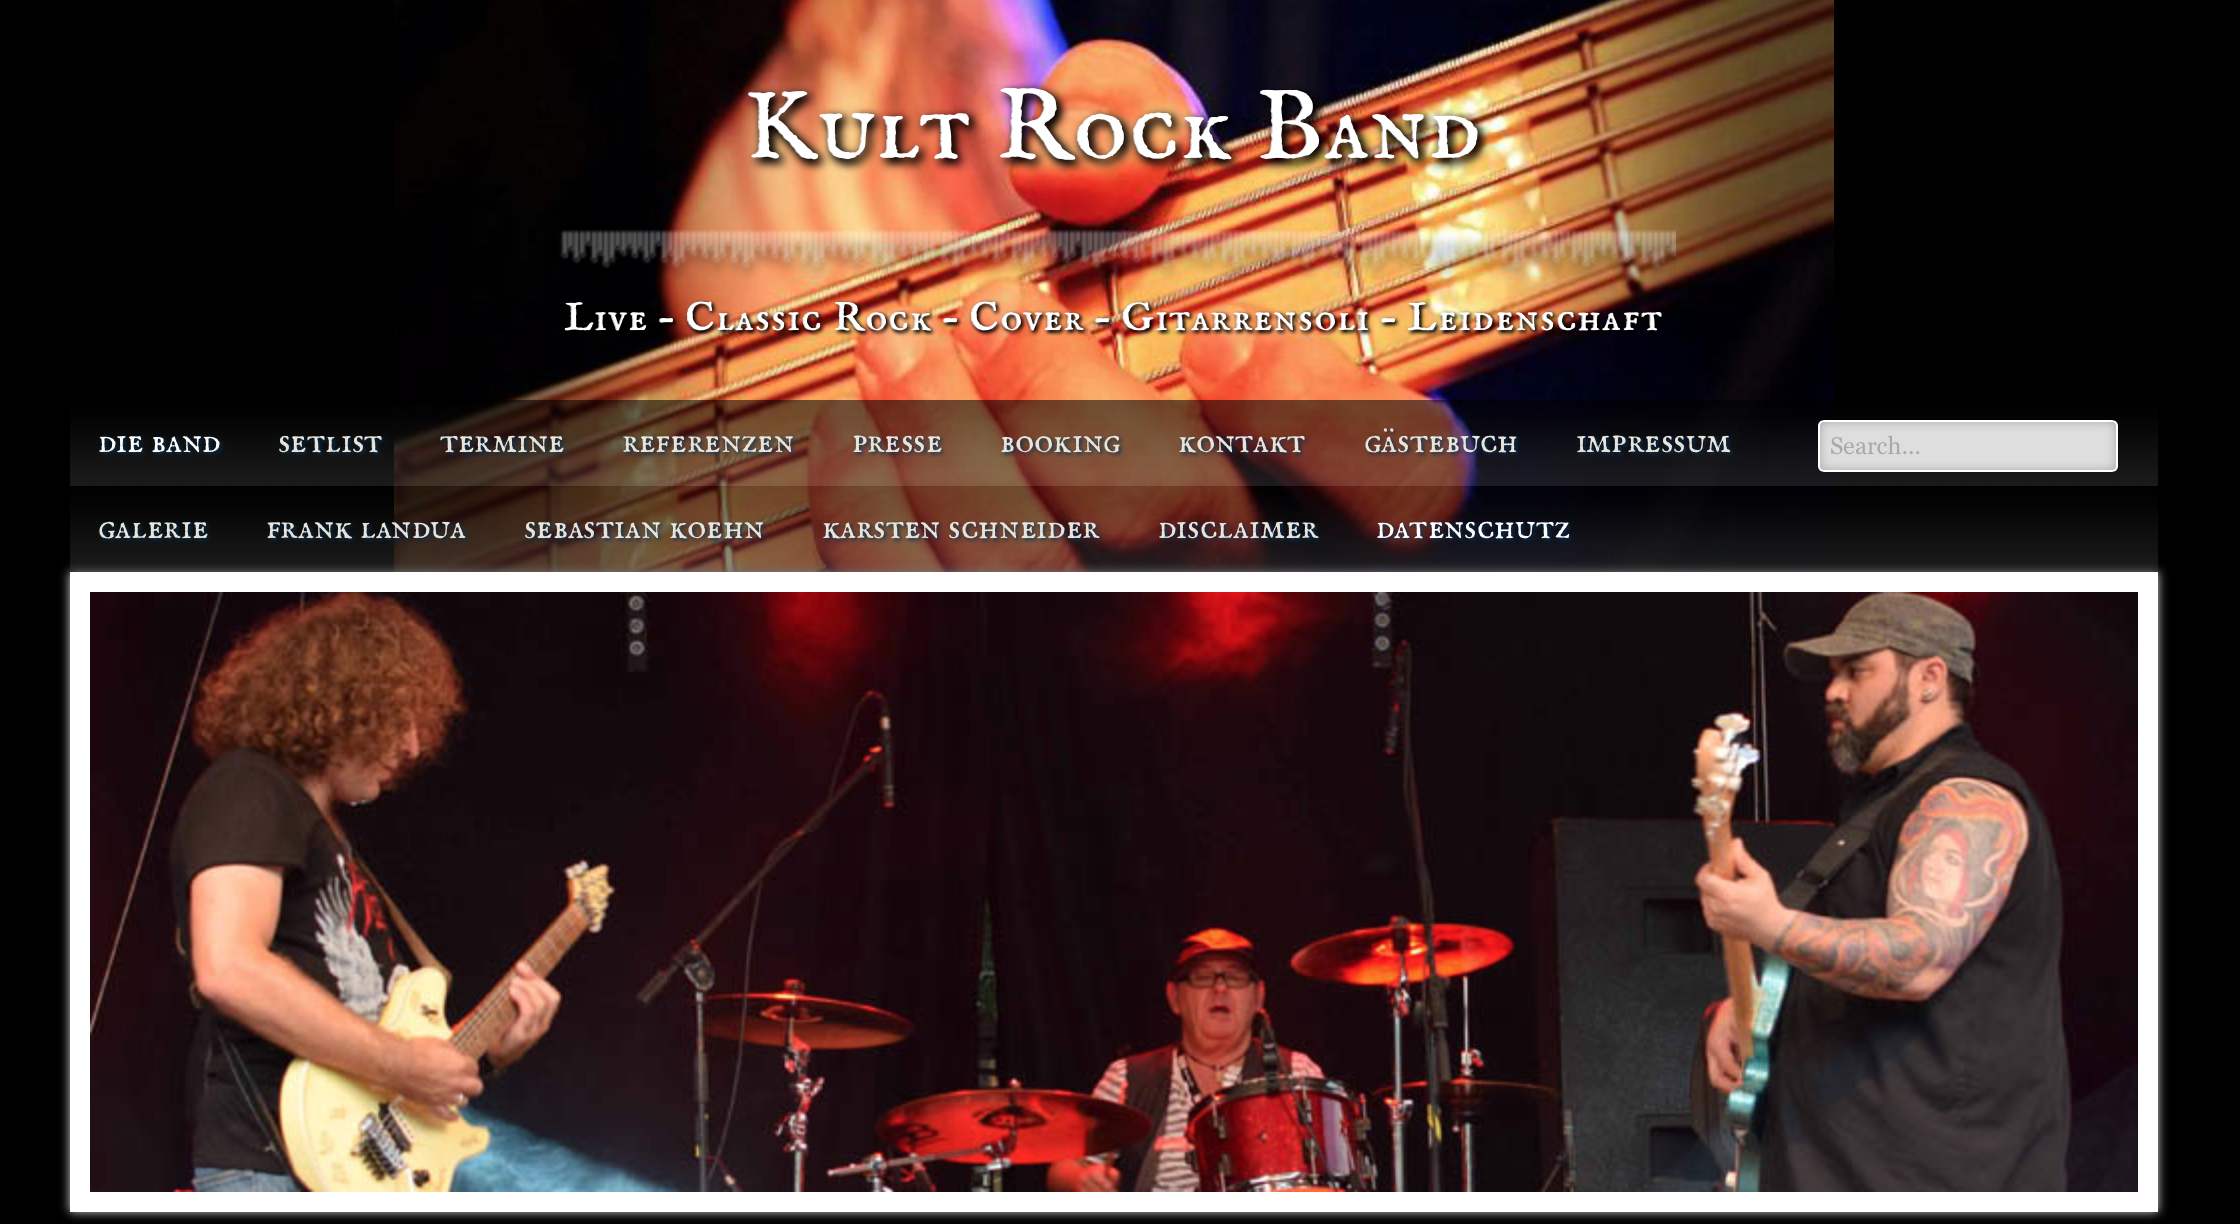 Kult Rock Band